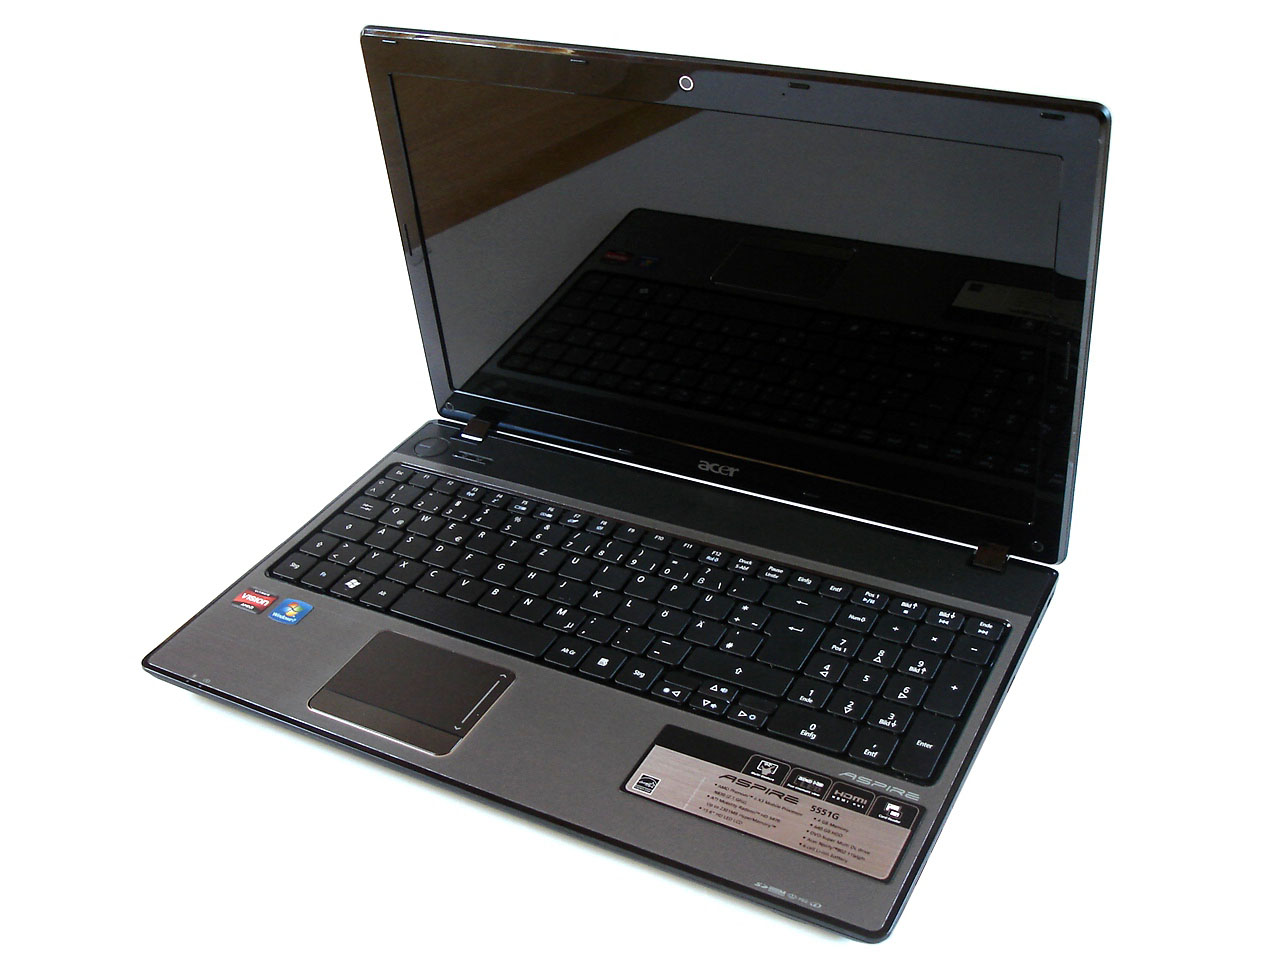 Acer Aspire 5551 //5552 Mainboard //Grafikkarten Notebook Reparatur inc Chiptausch